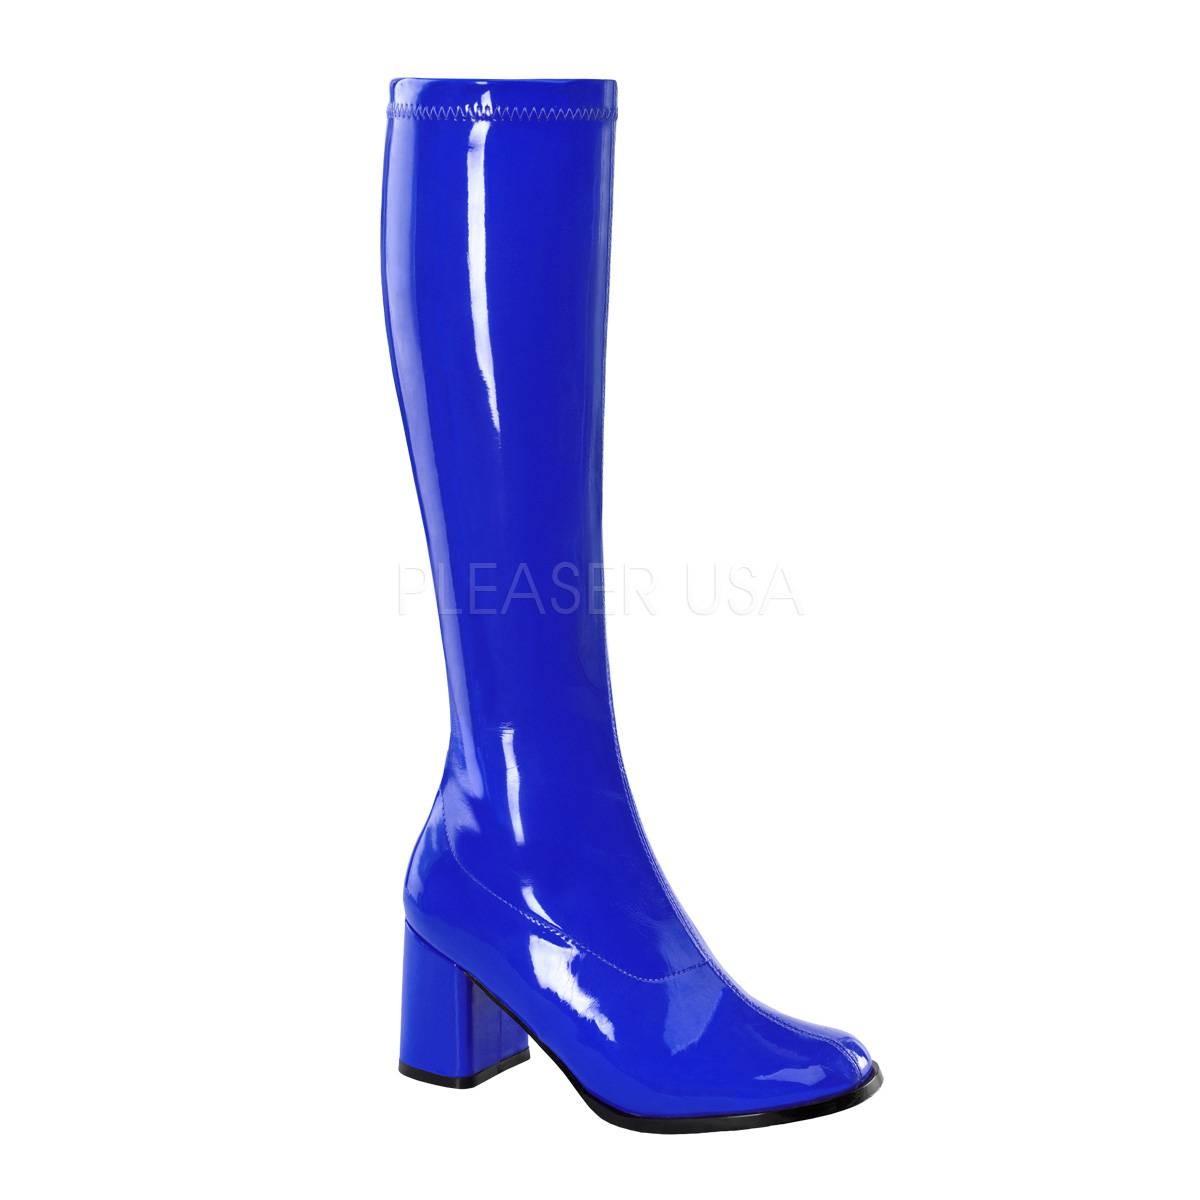 Stiefel - GOGO 300 ° Damen Stiefel ° Blau Glänzend ° Funtasma  - Onlineshop RedSixty